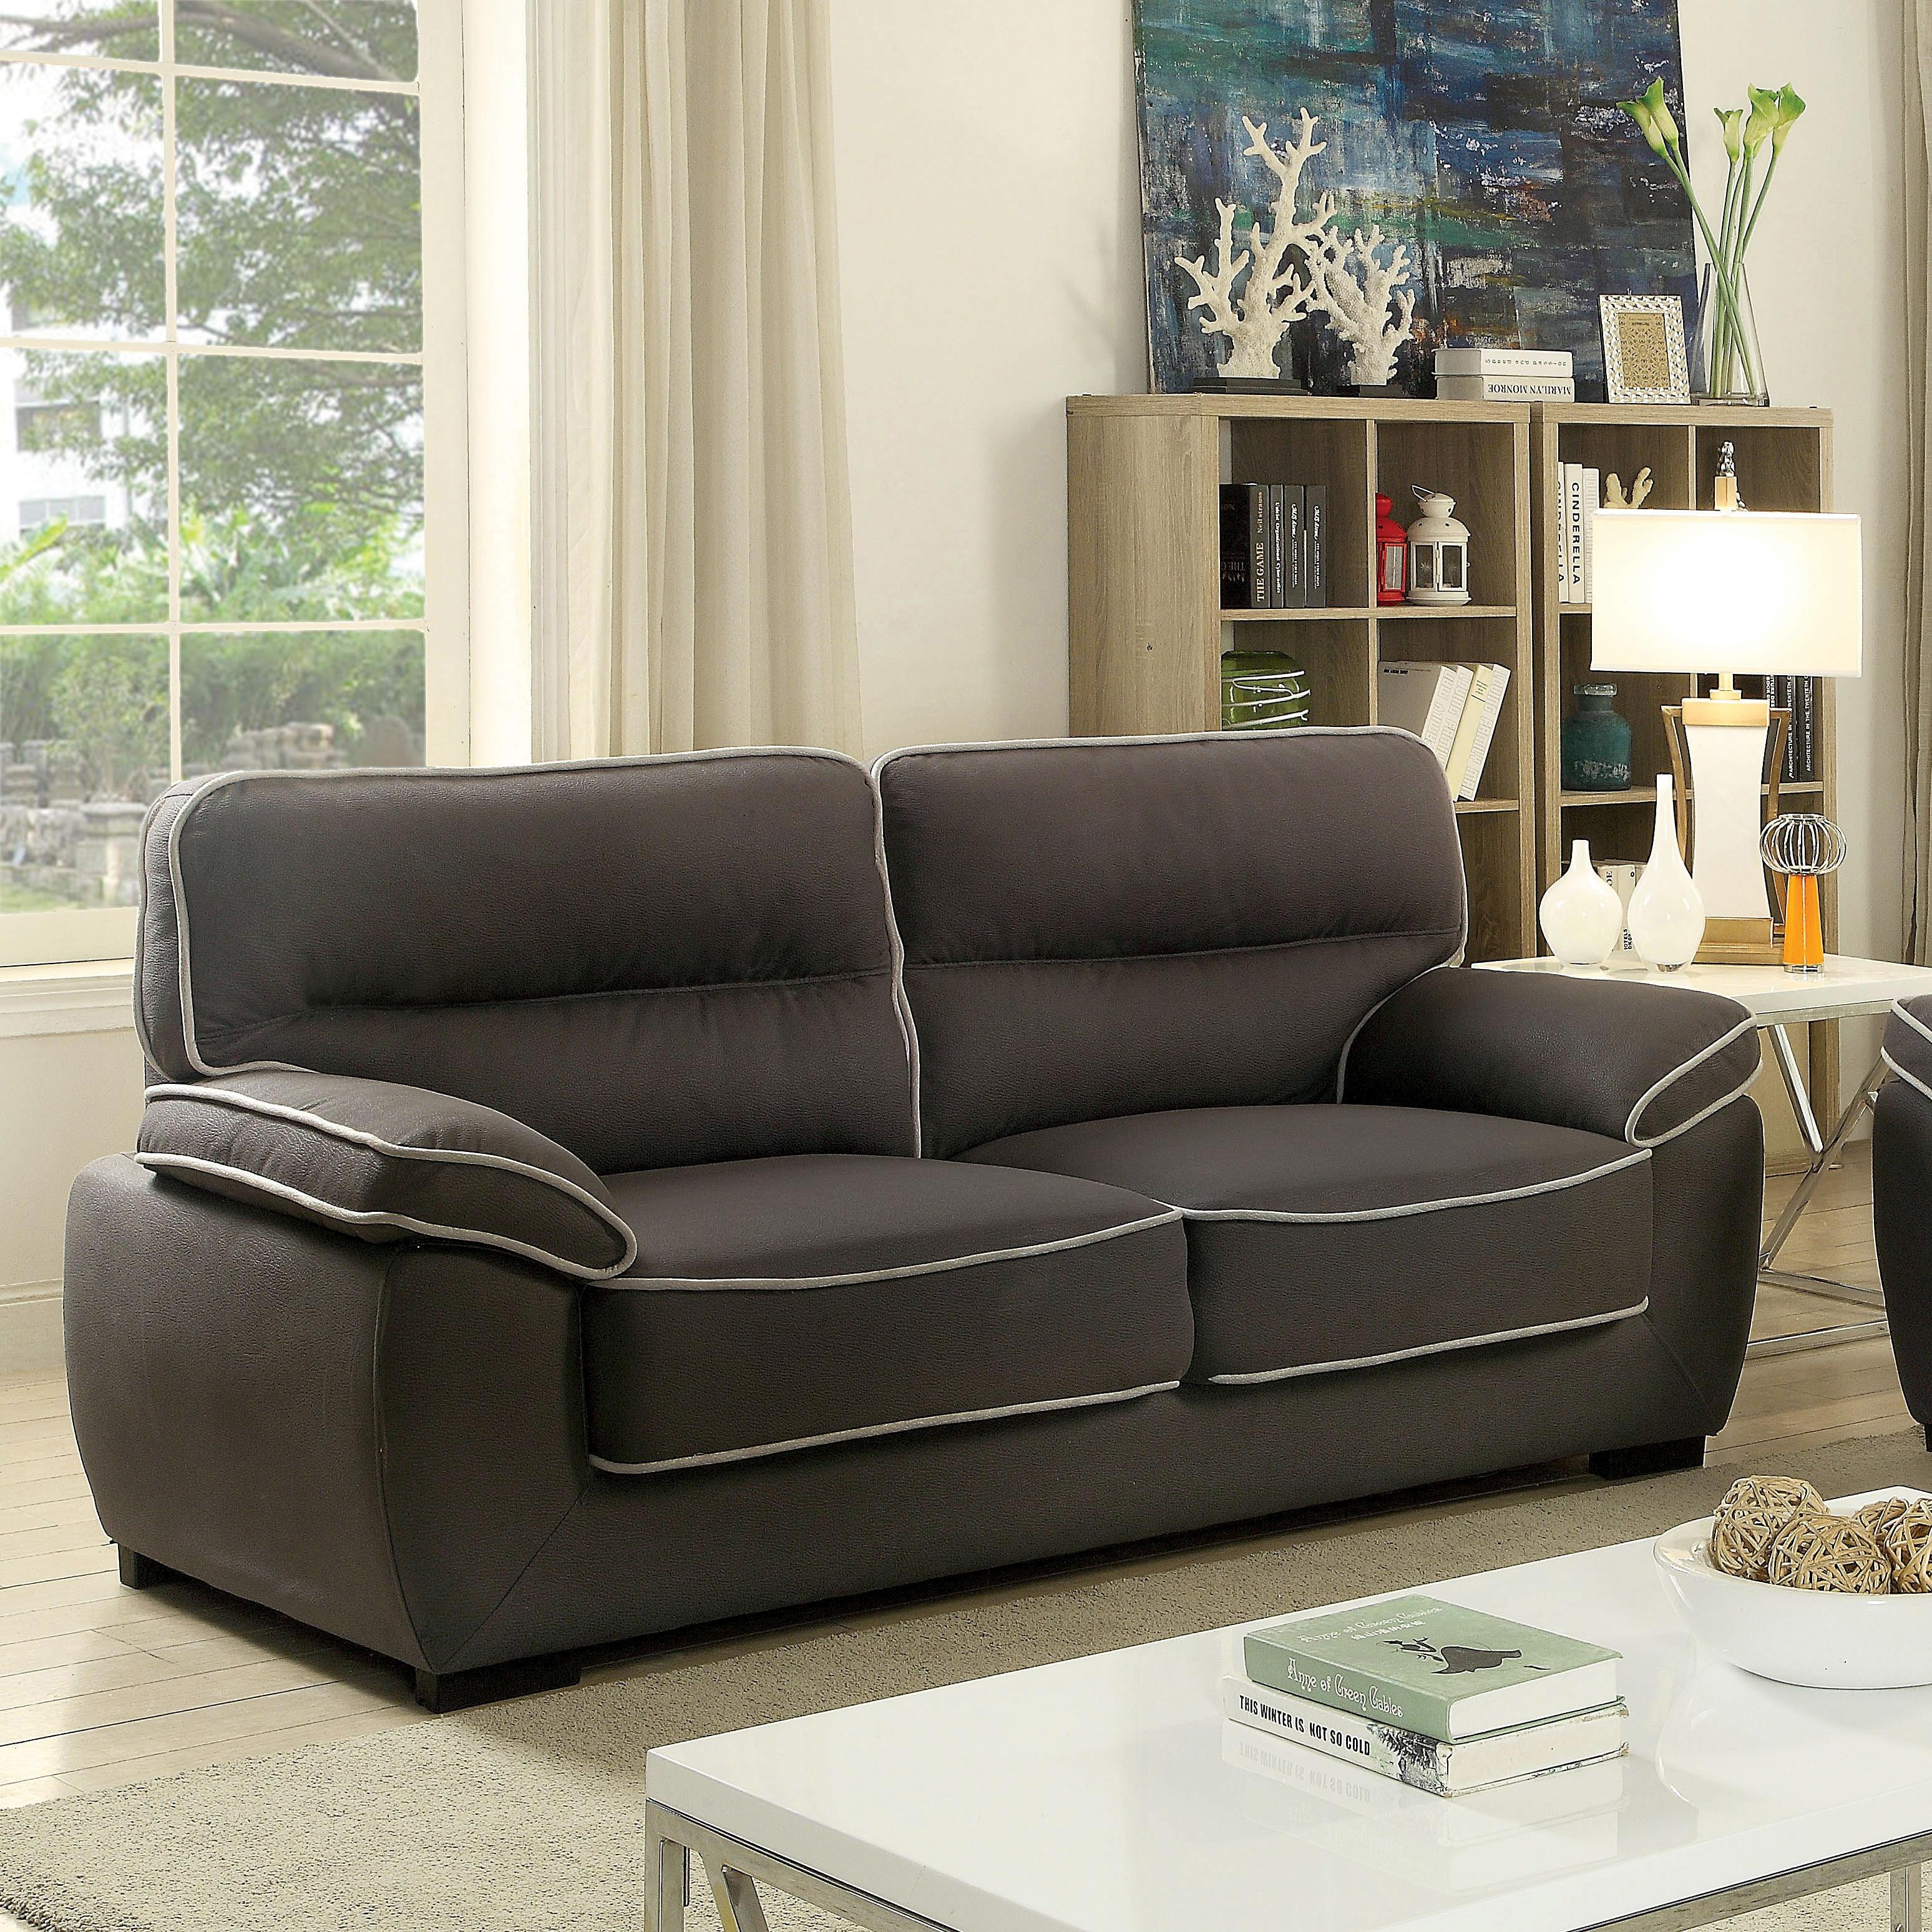 Shop Furniture Of America Kelvin Contemporary Faux Nubuck Fabric Graphite  Sofa   Free Shipping Today   Overstock.com   16497996